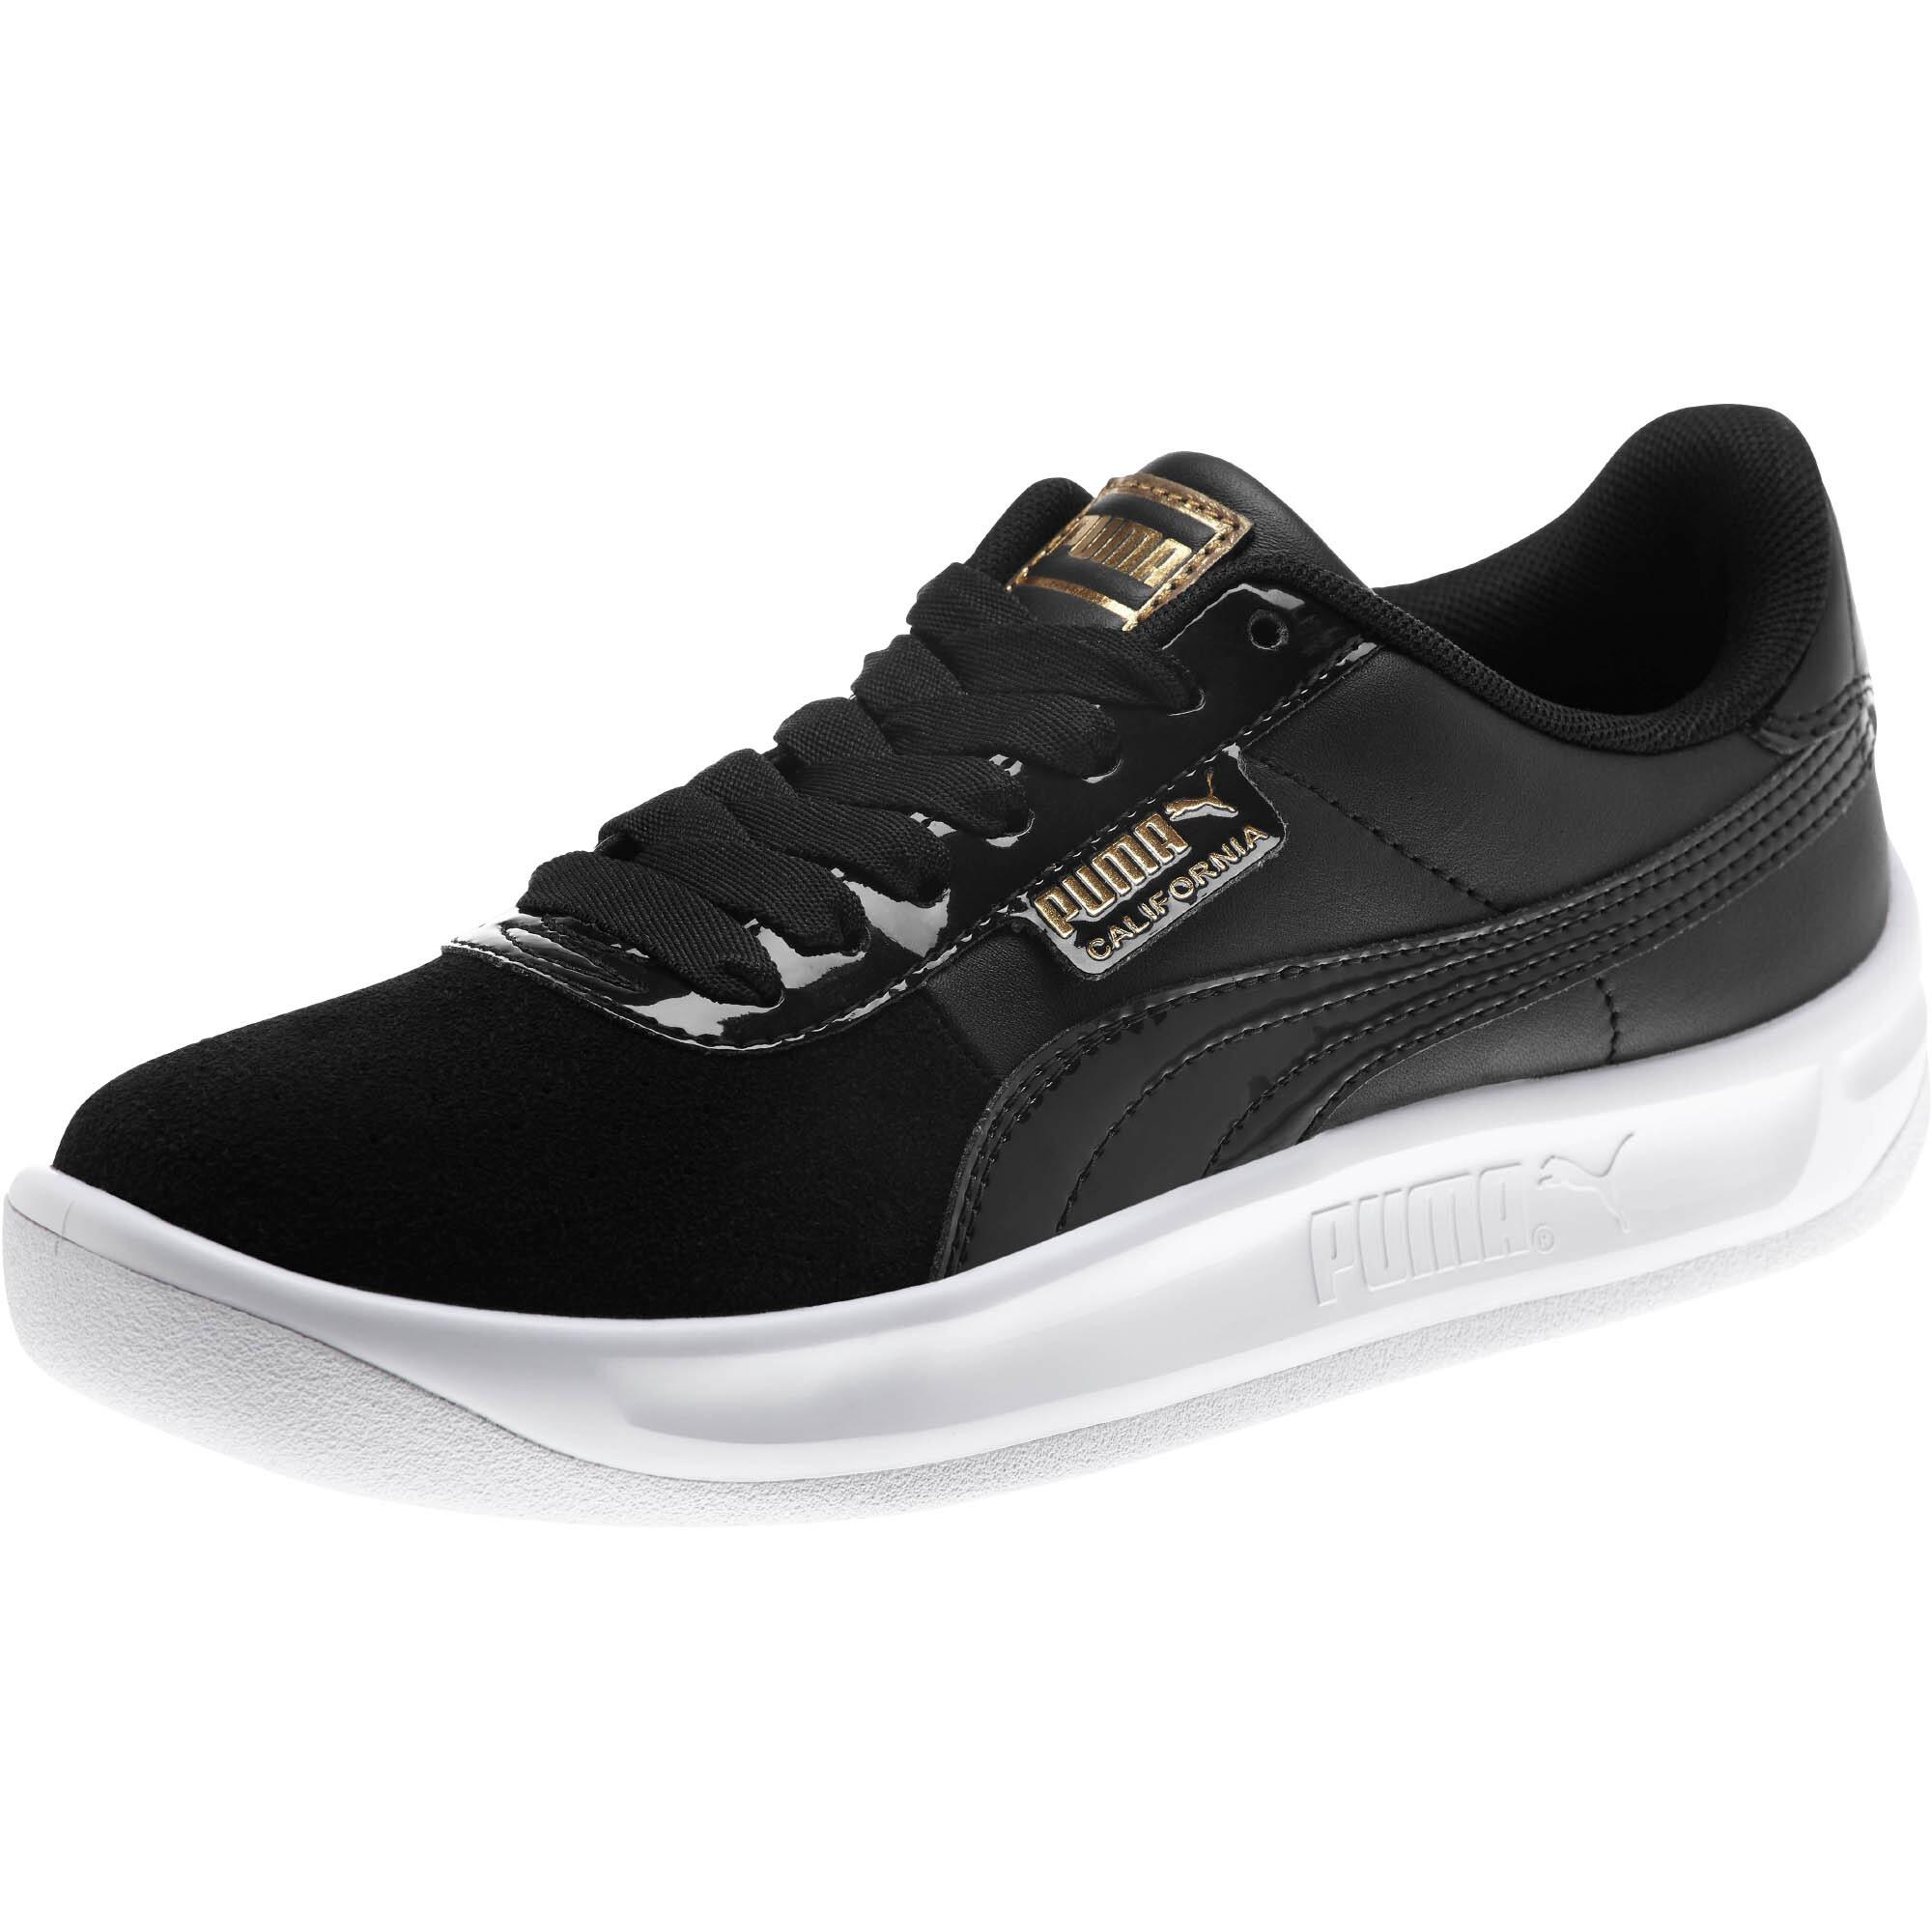 PUMA-Women-039-s-California-Monochrome-Sneakers thumbnail 4